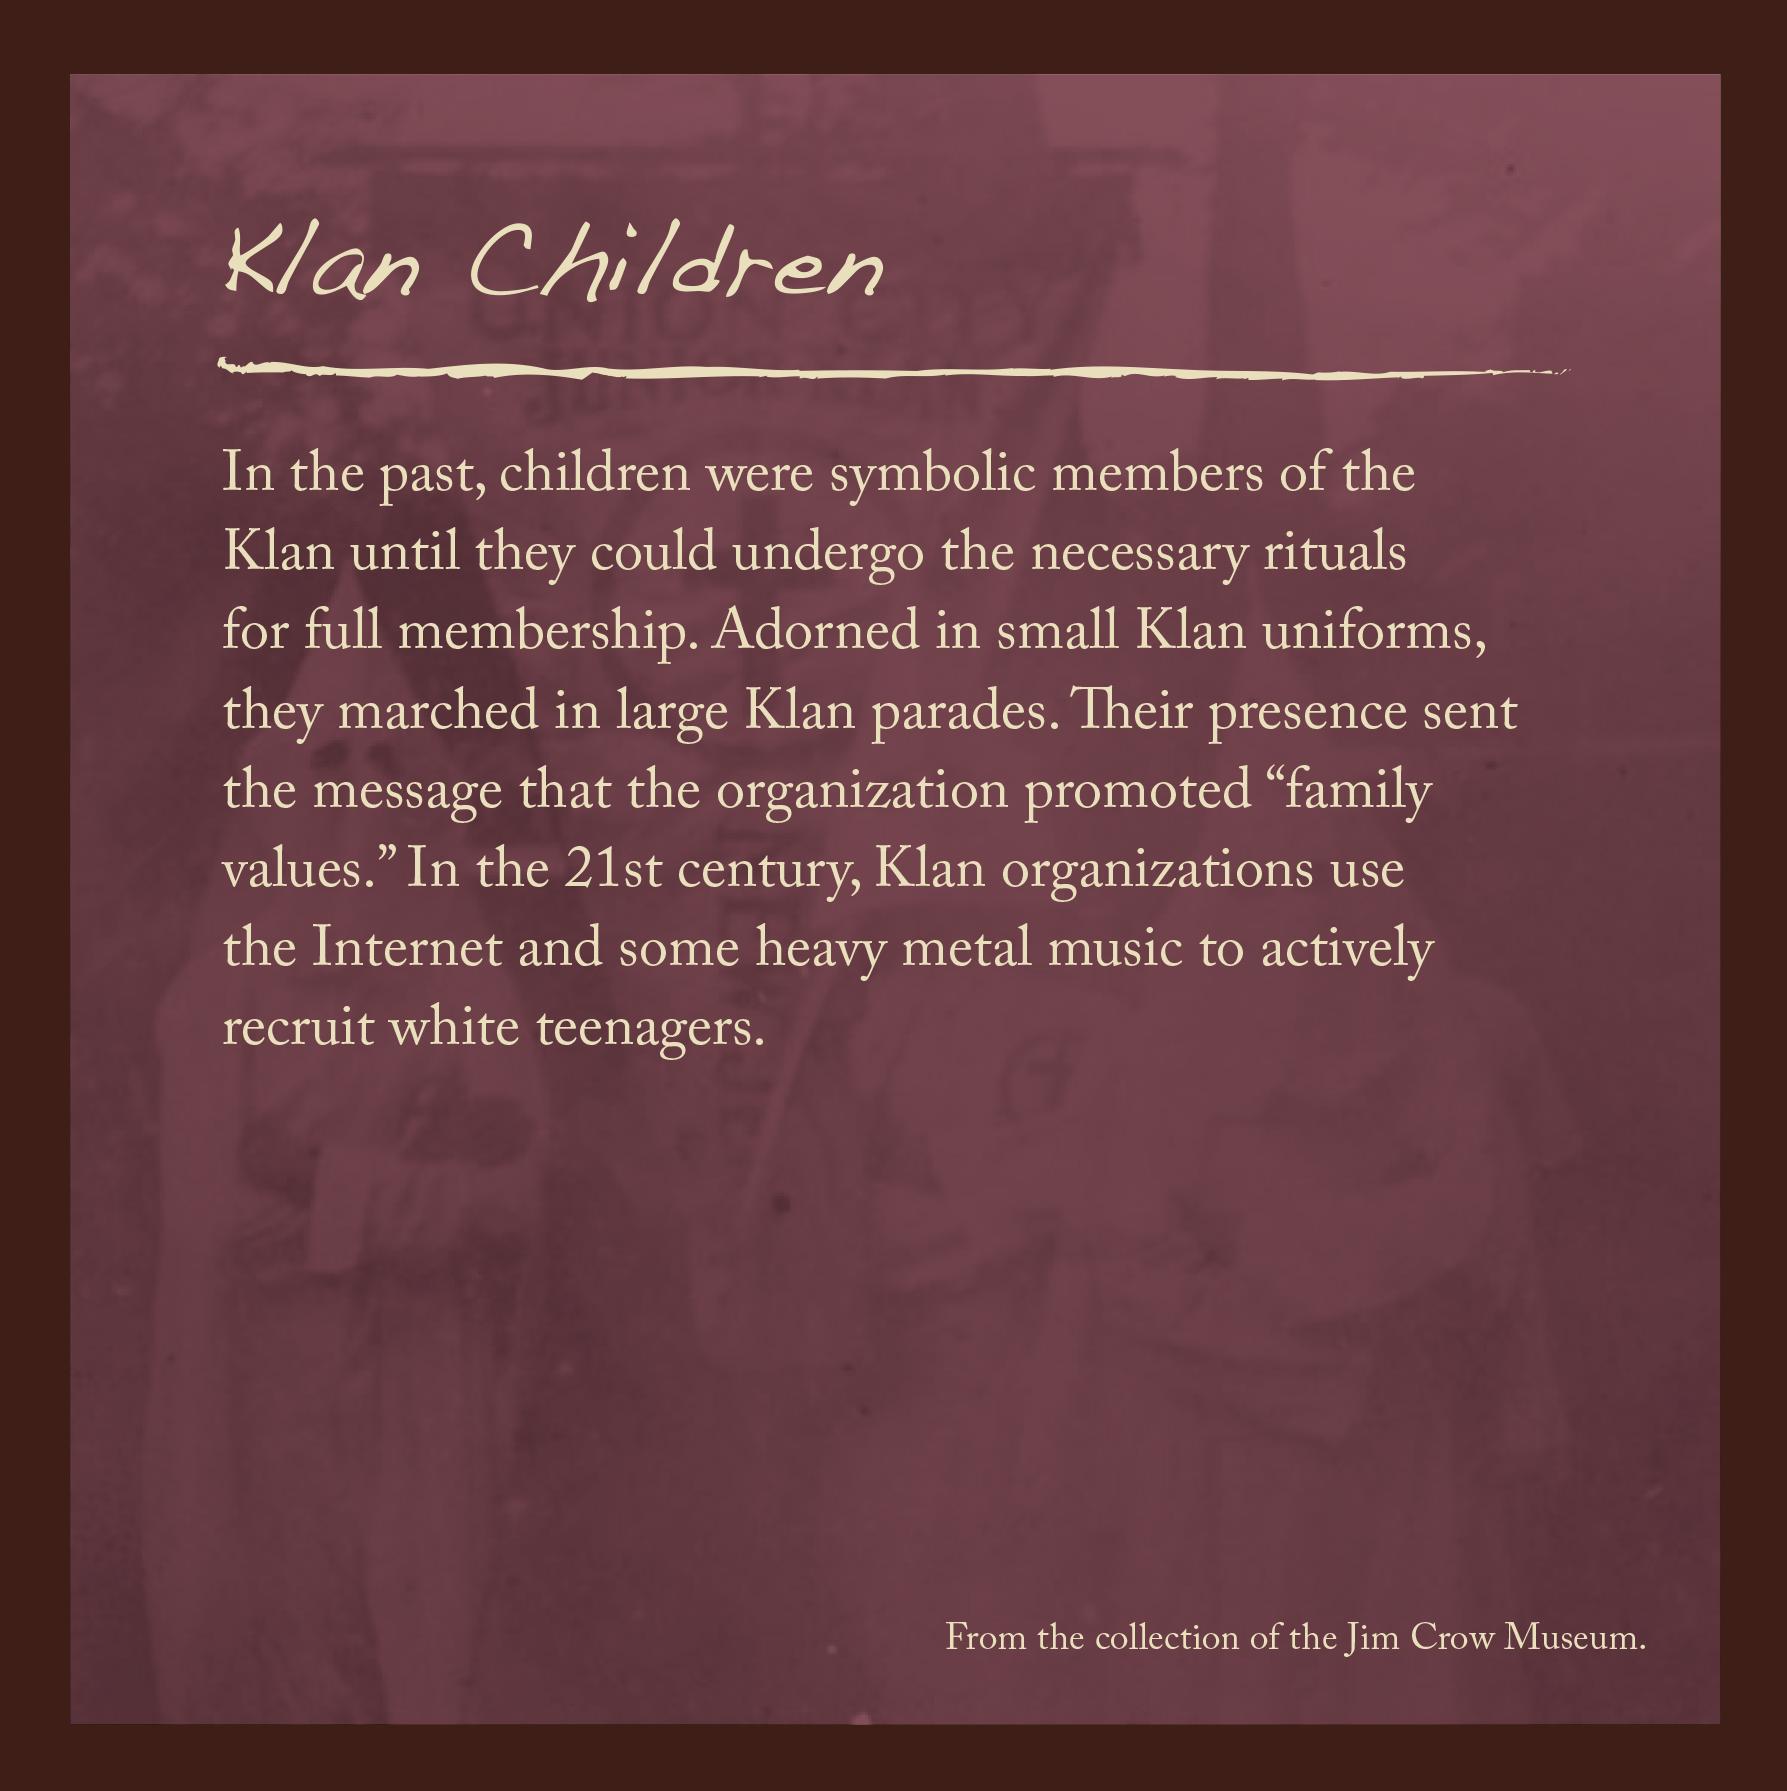 Klan Children.jpg